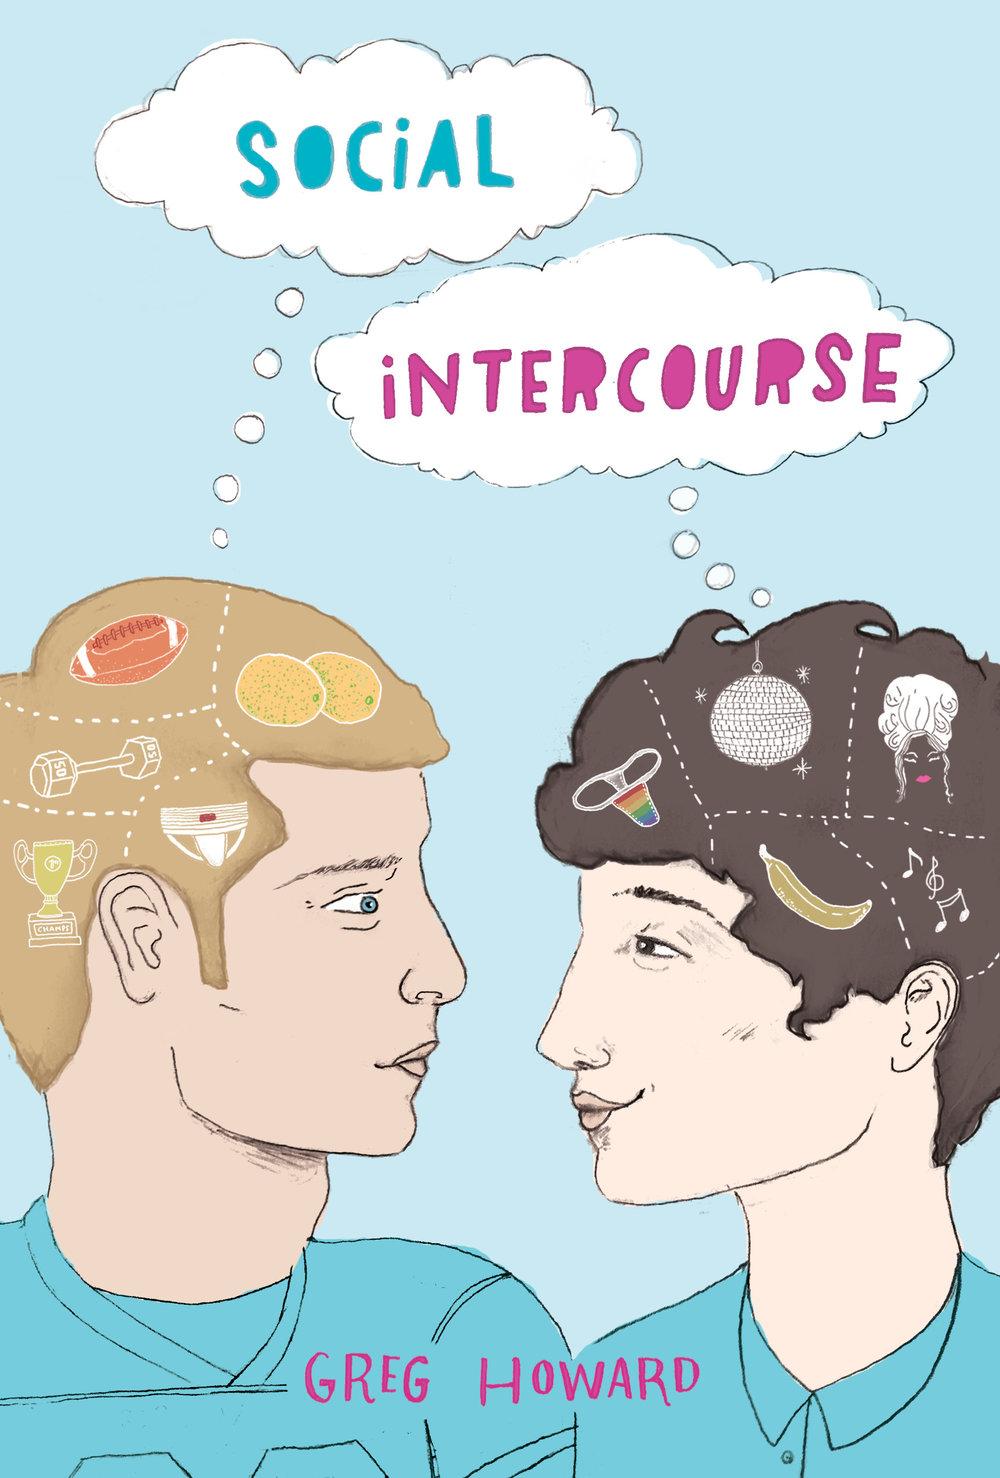 social intercourse, greg howard, book, ya, young adult, romance